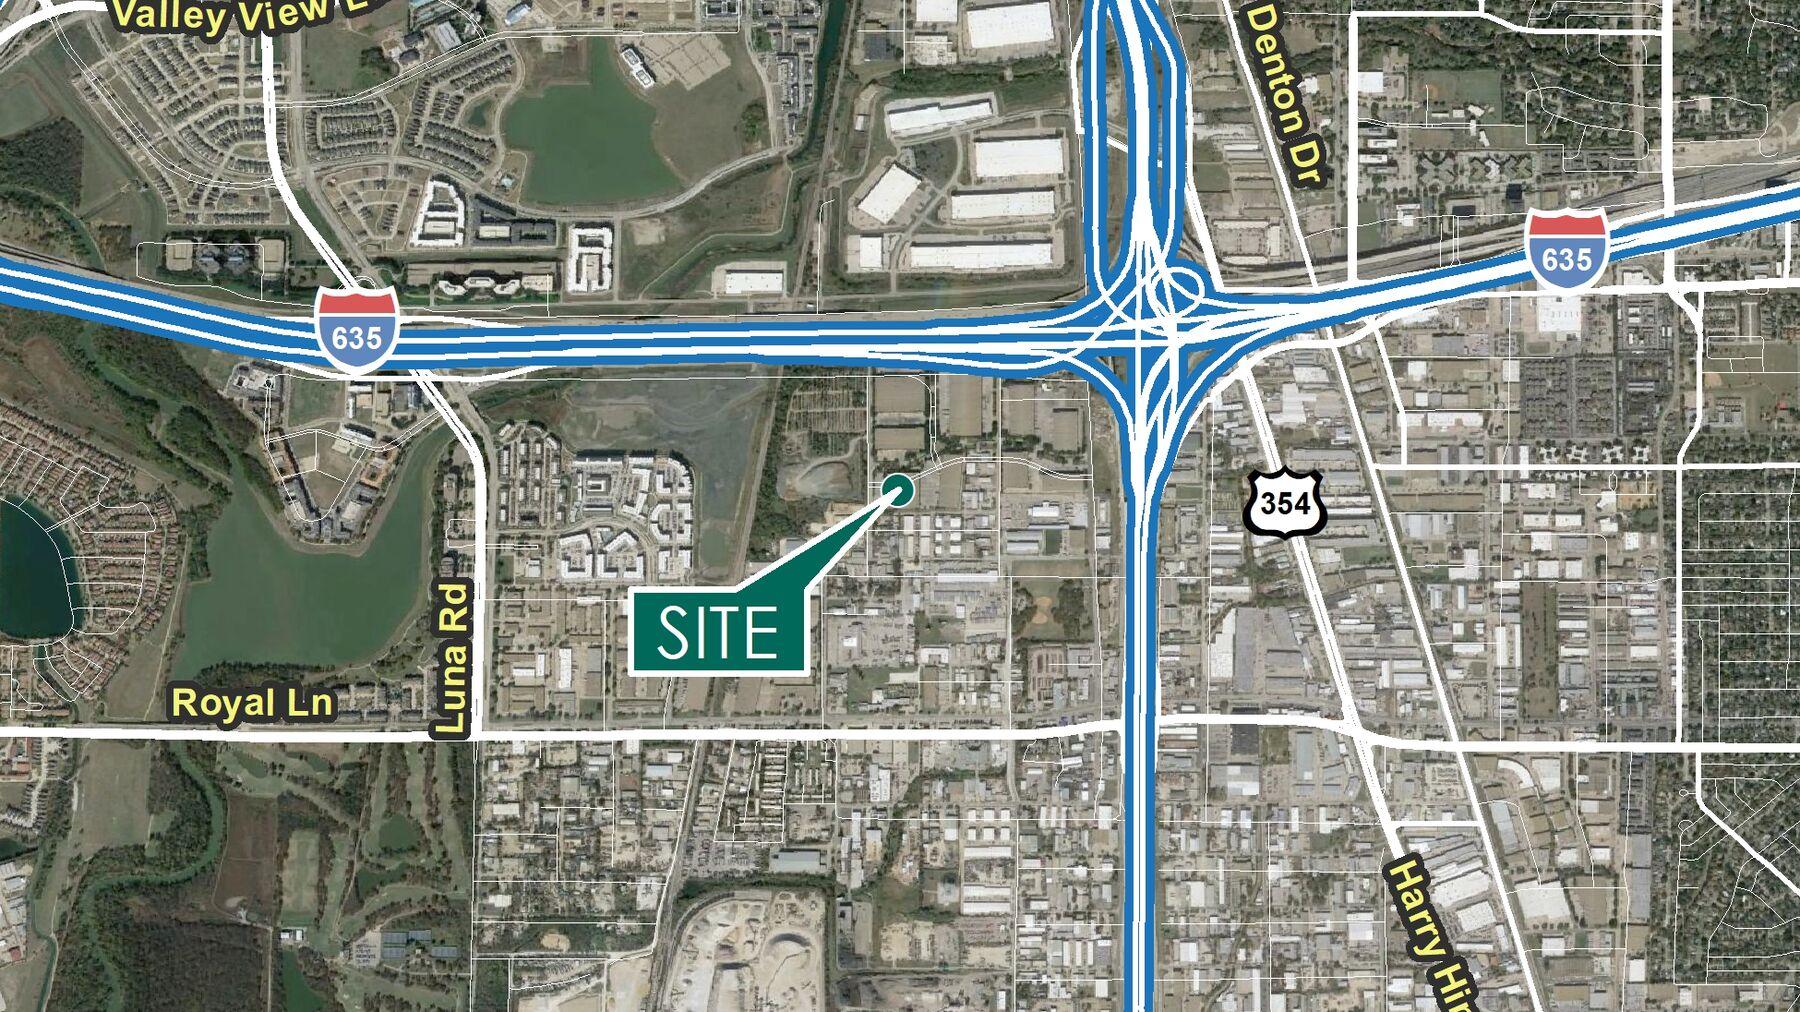 DPM-Prologis-Dallas-Corp-Ctr-11-DAL00111-11550-Newberry-Street_AerialMap.jpg